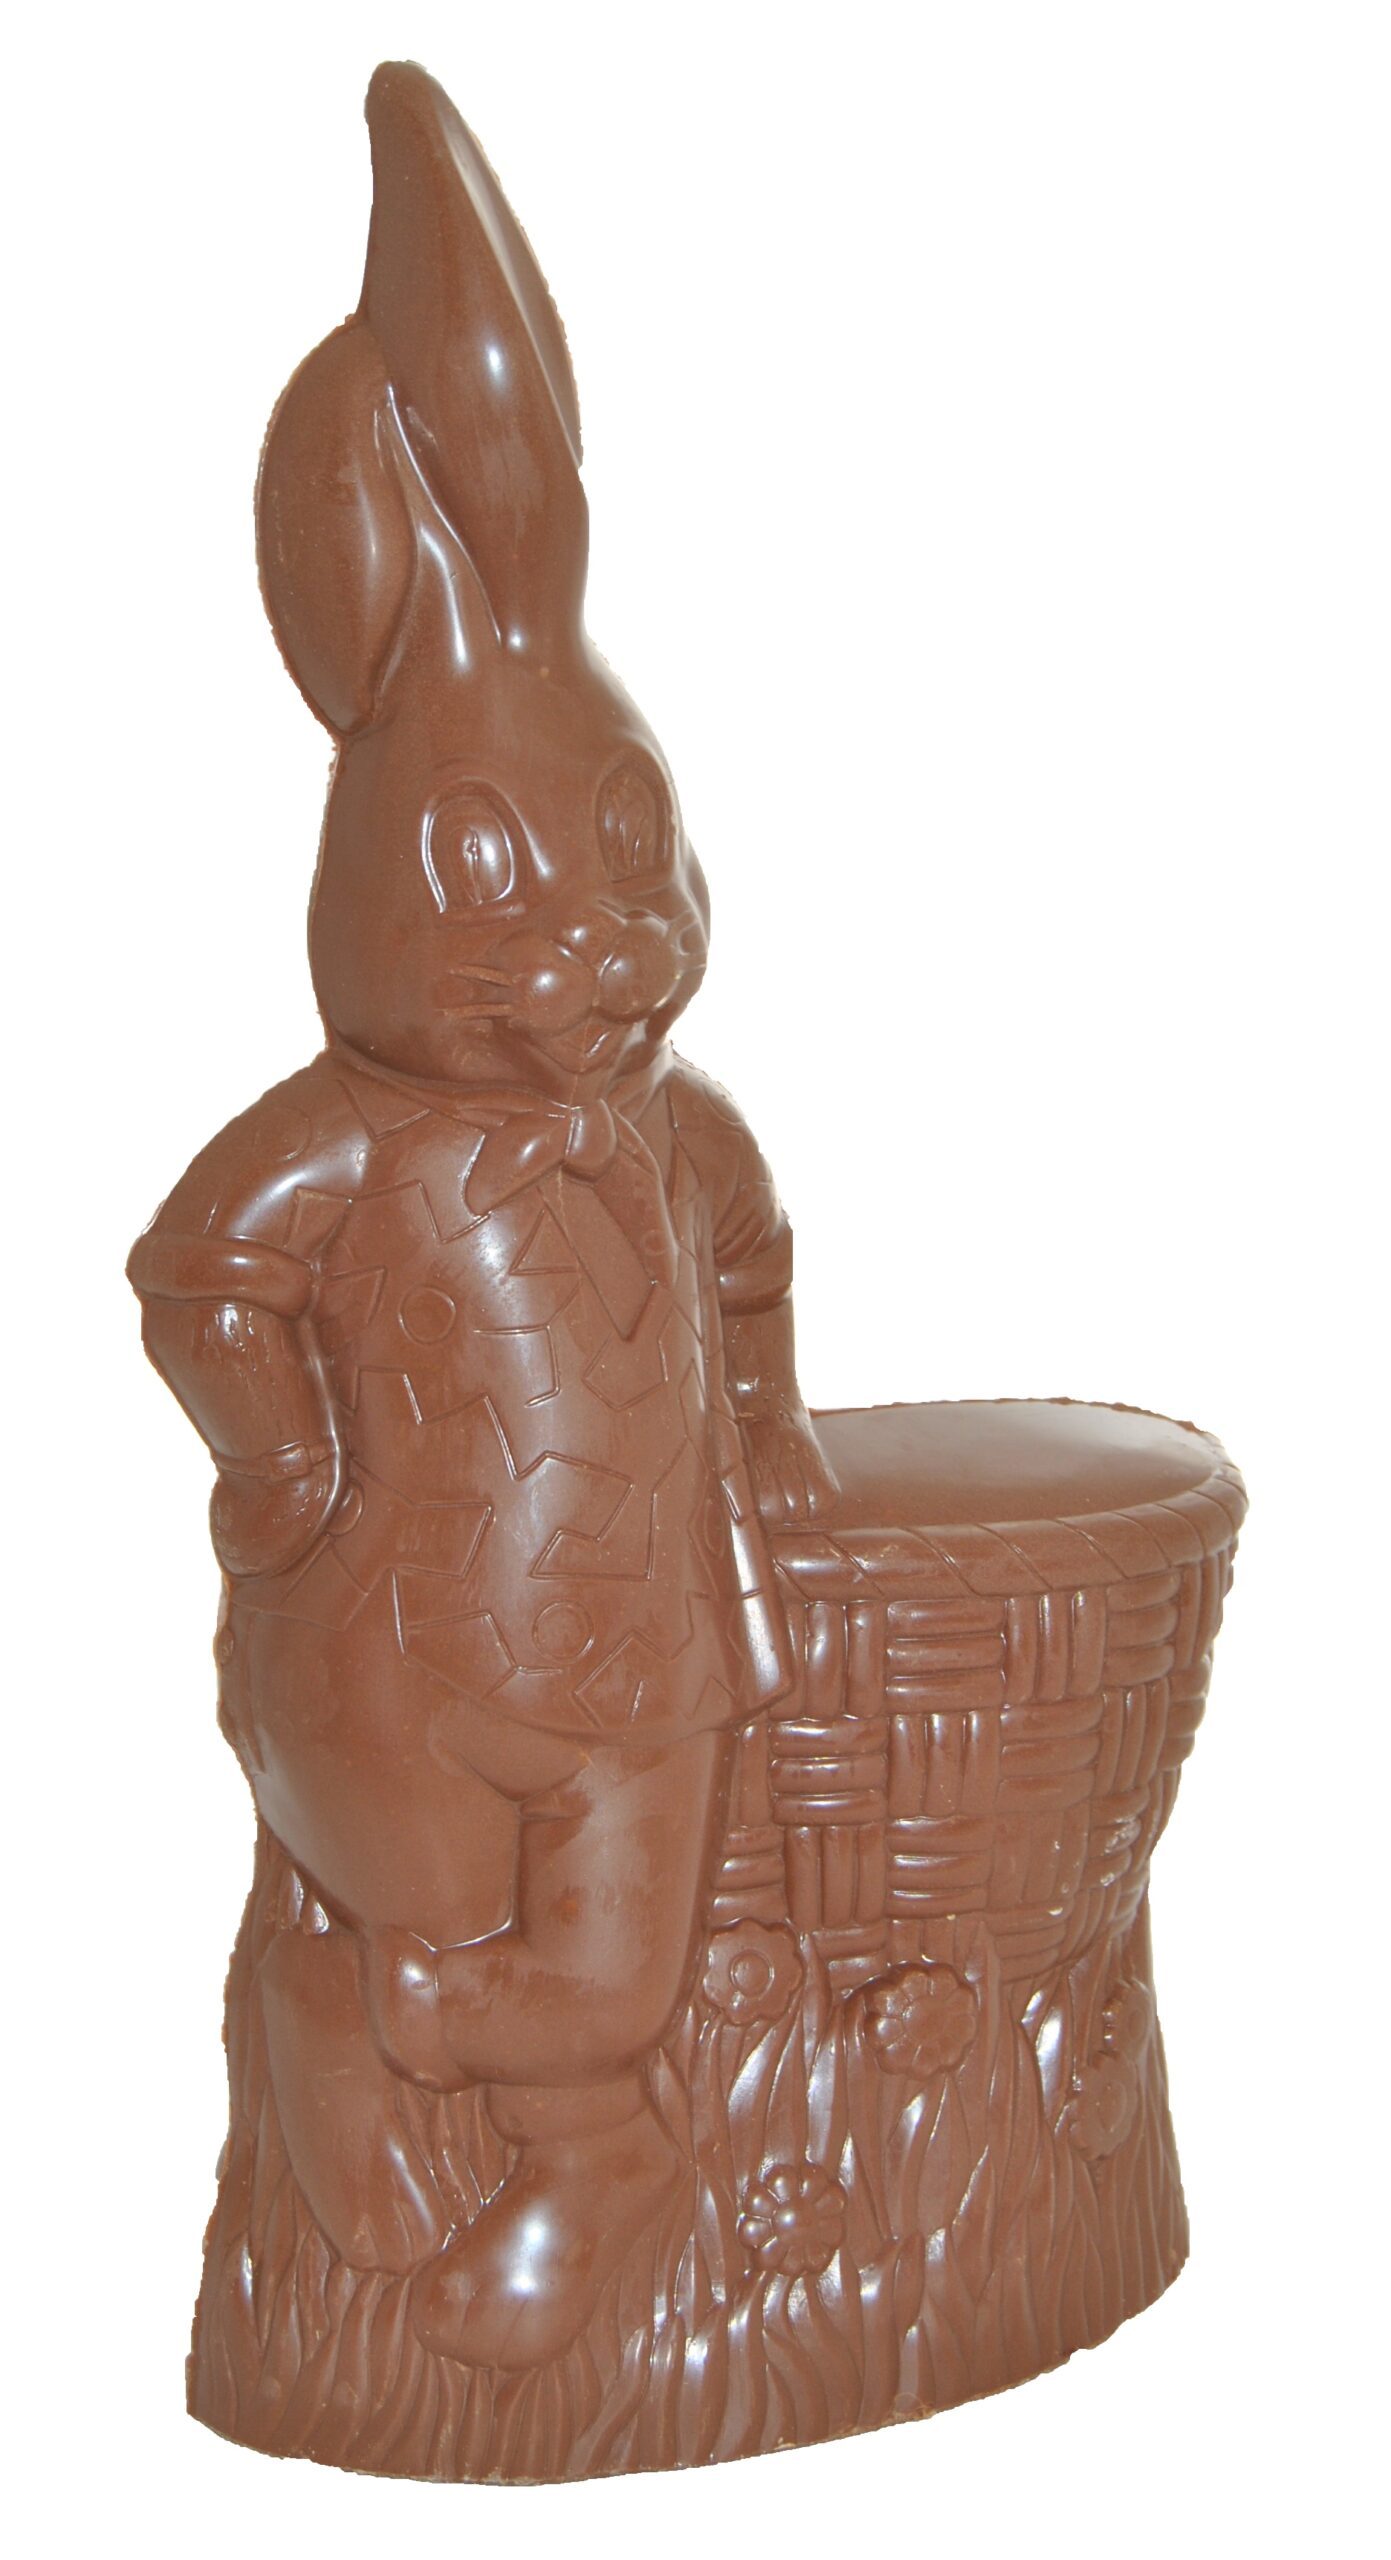 chocolade-paashaas-bestellen-bezorgen